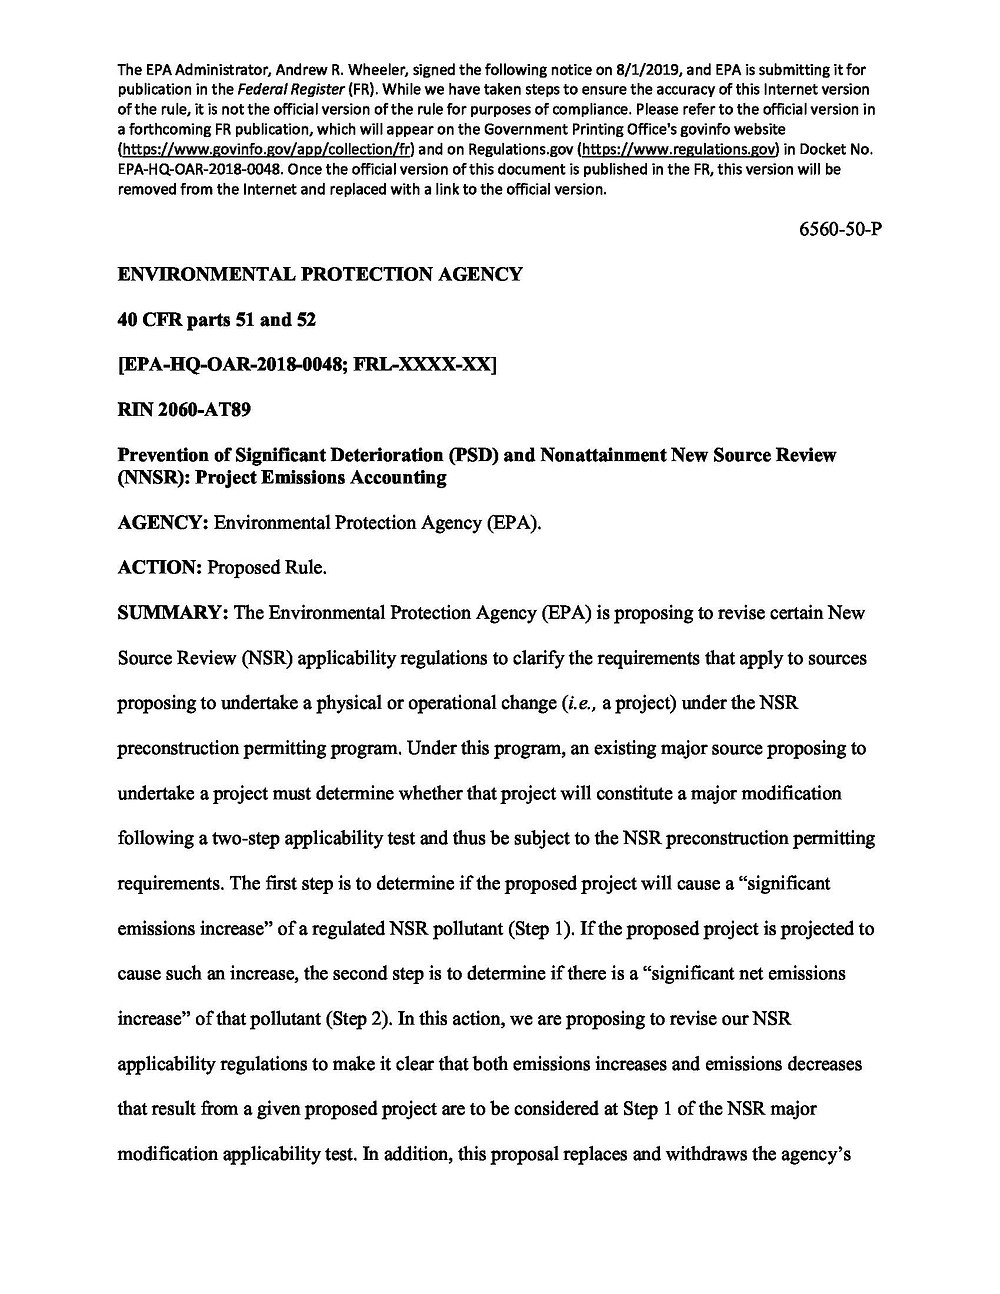 Picture of pre-publication notice